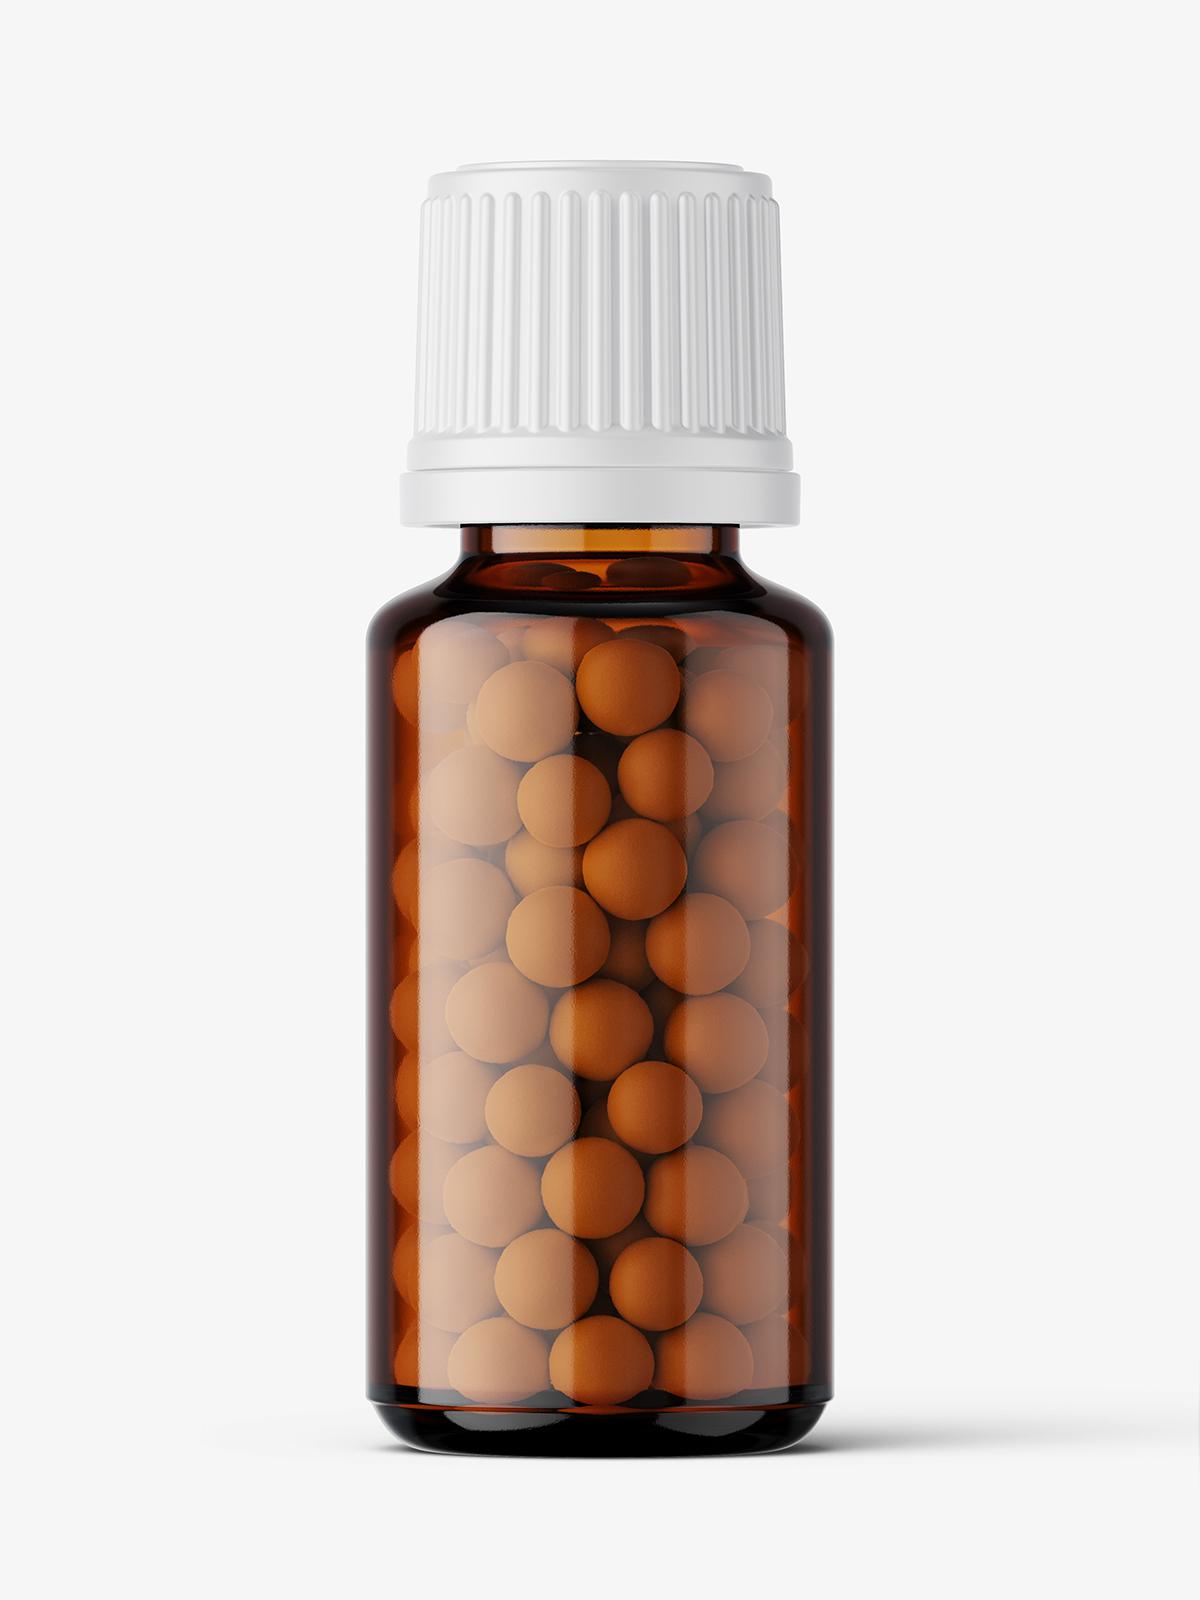 Download Amber bottle with pills mockup / 15 ml - Smarty Mockups Free Mockups